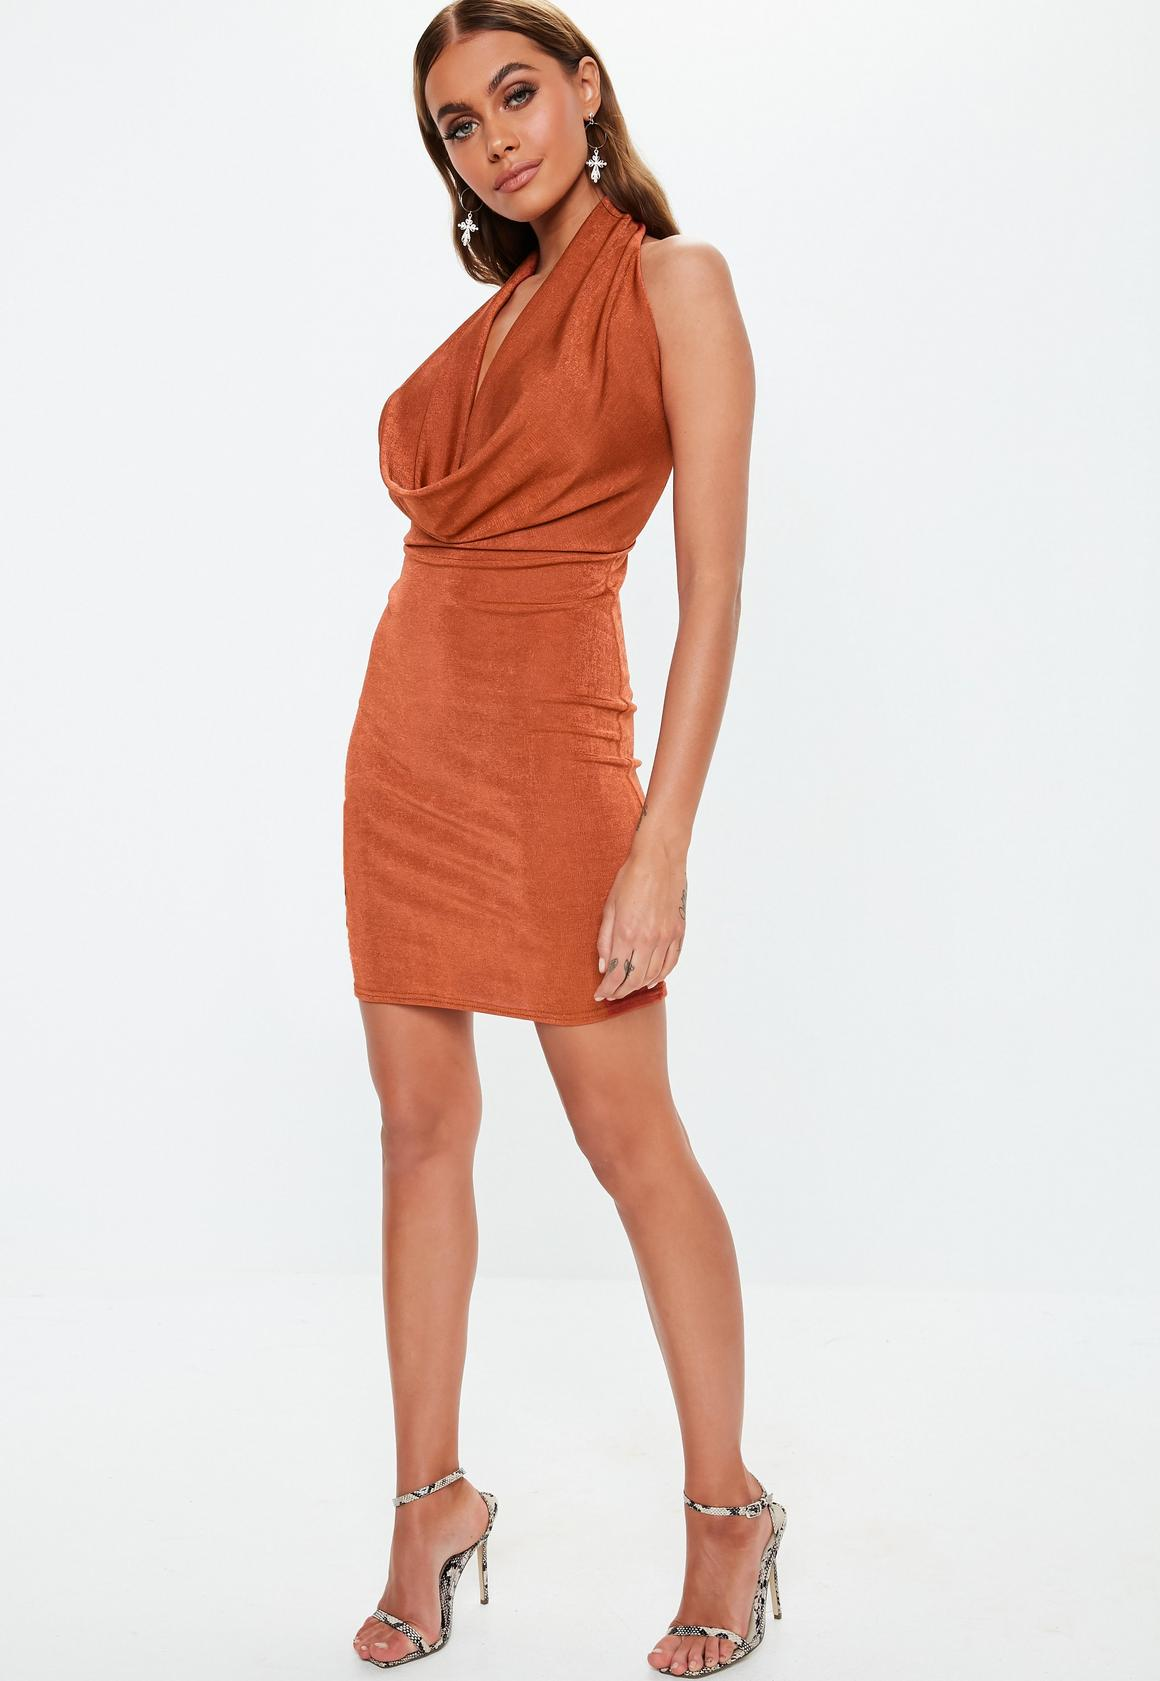 Missguided - robe courte dos-nu  à col bénitier - 2